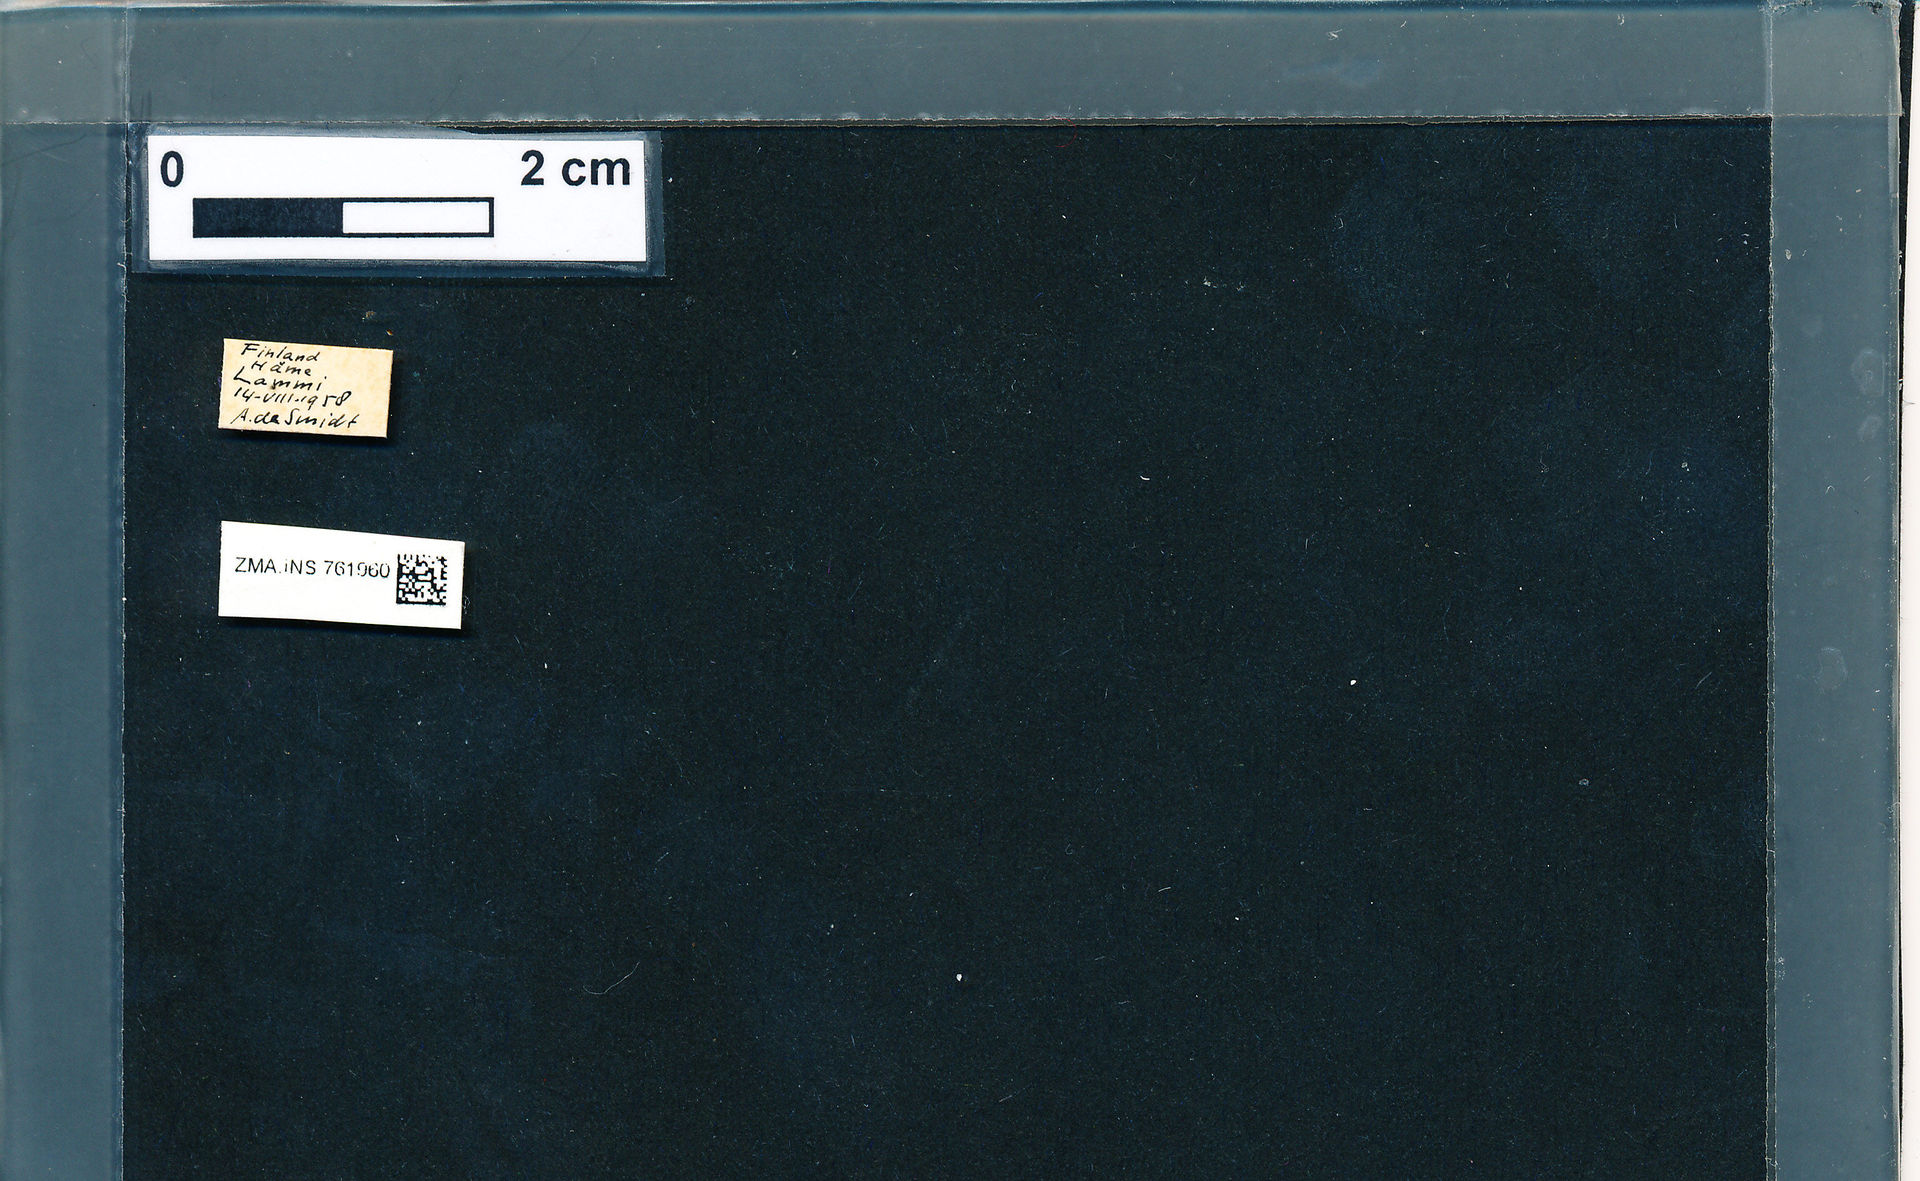 ZMA.INS.761960 | Bombus (Pyrobombus) pratorum pratorum Linnaeus, 1761